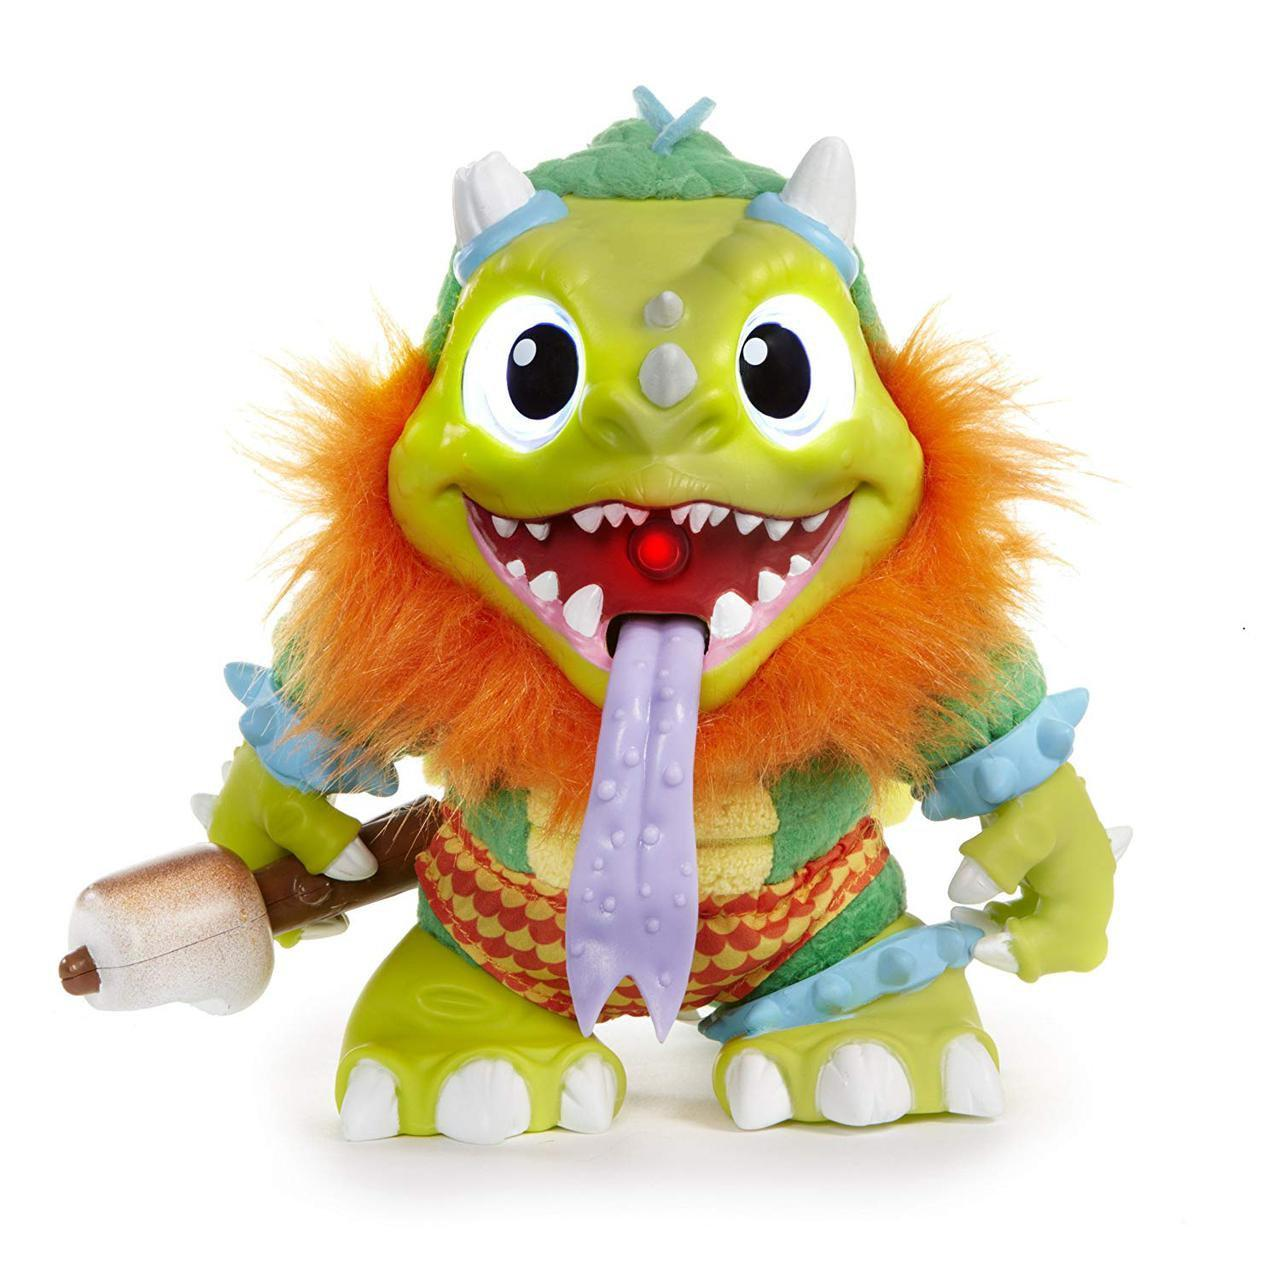 Интерактивная игрушка дракончик Crate Creatures Surprise/Потяни за язык 20 см